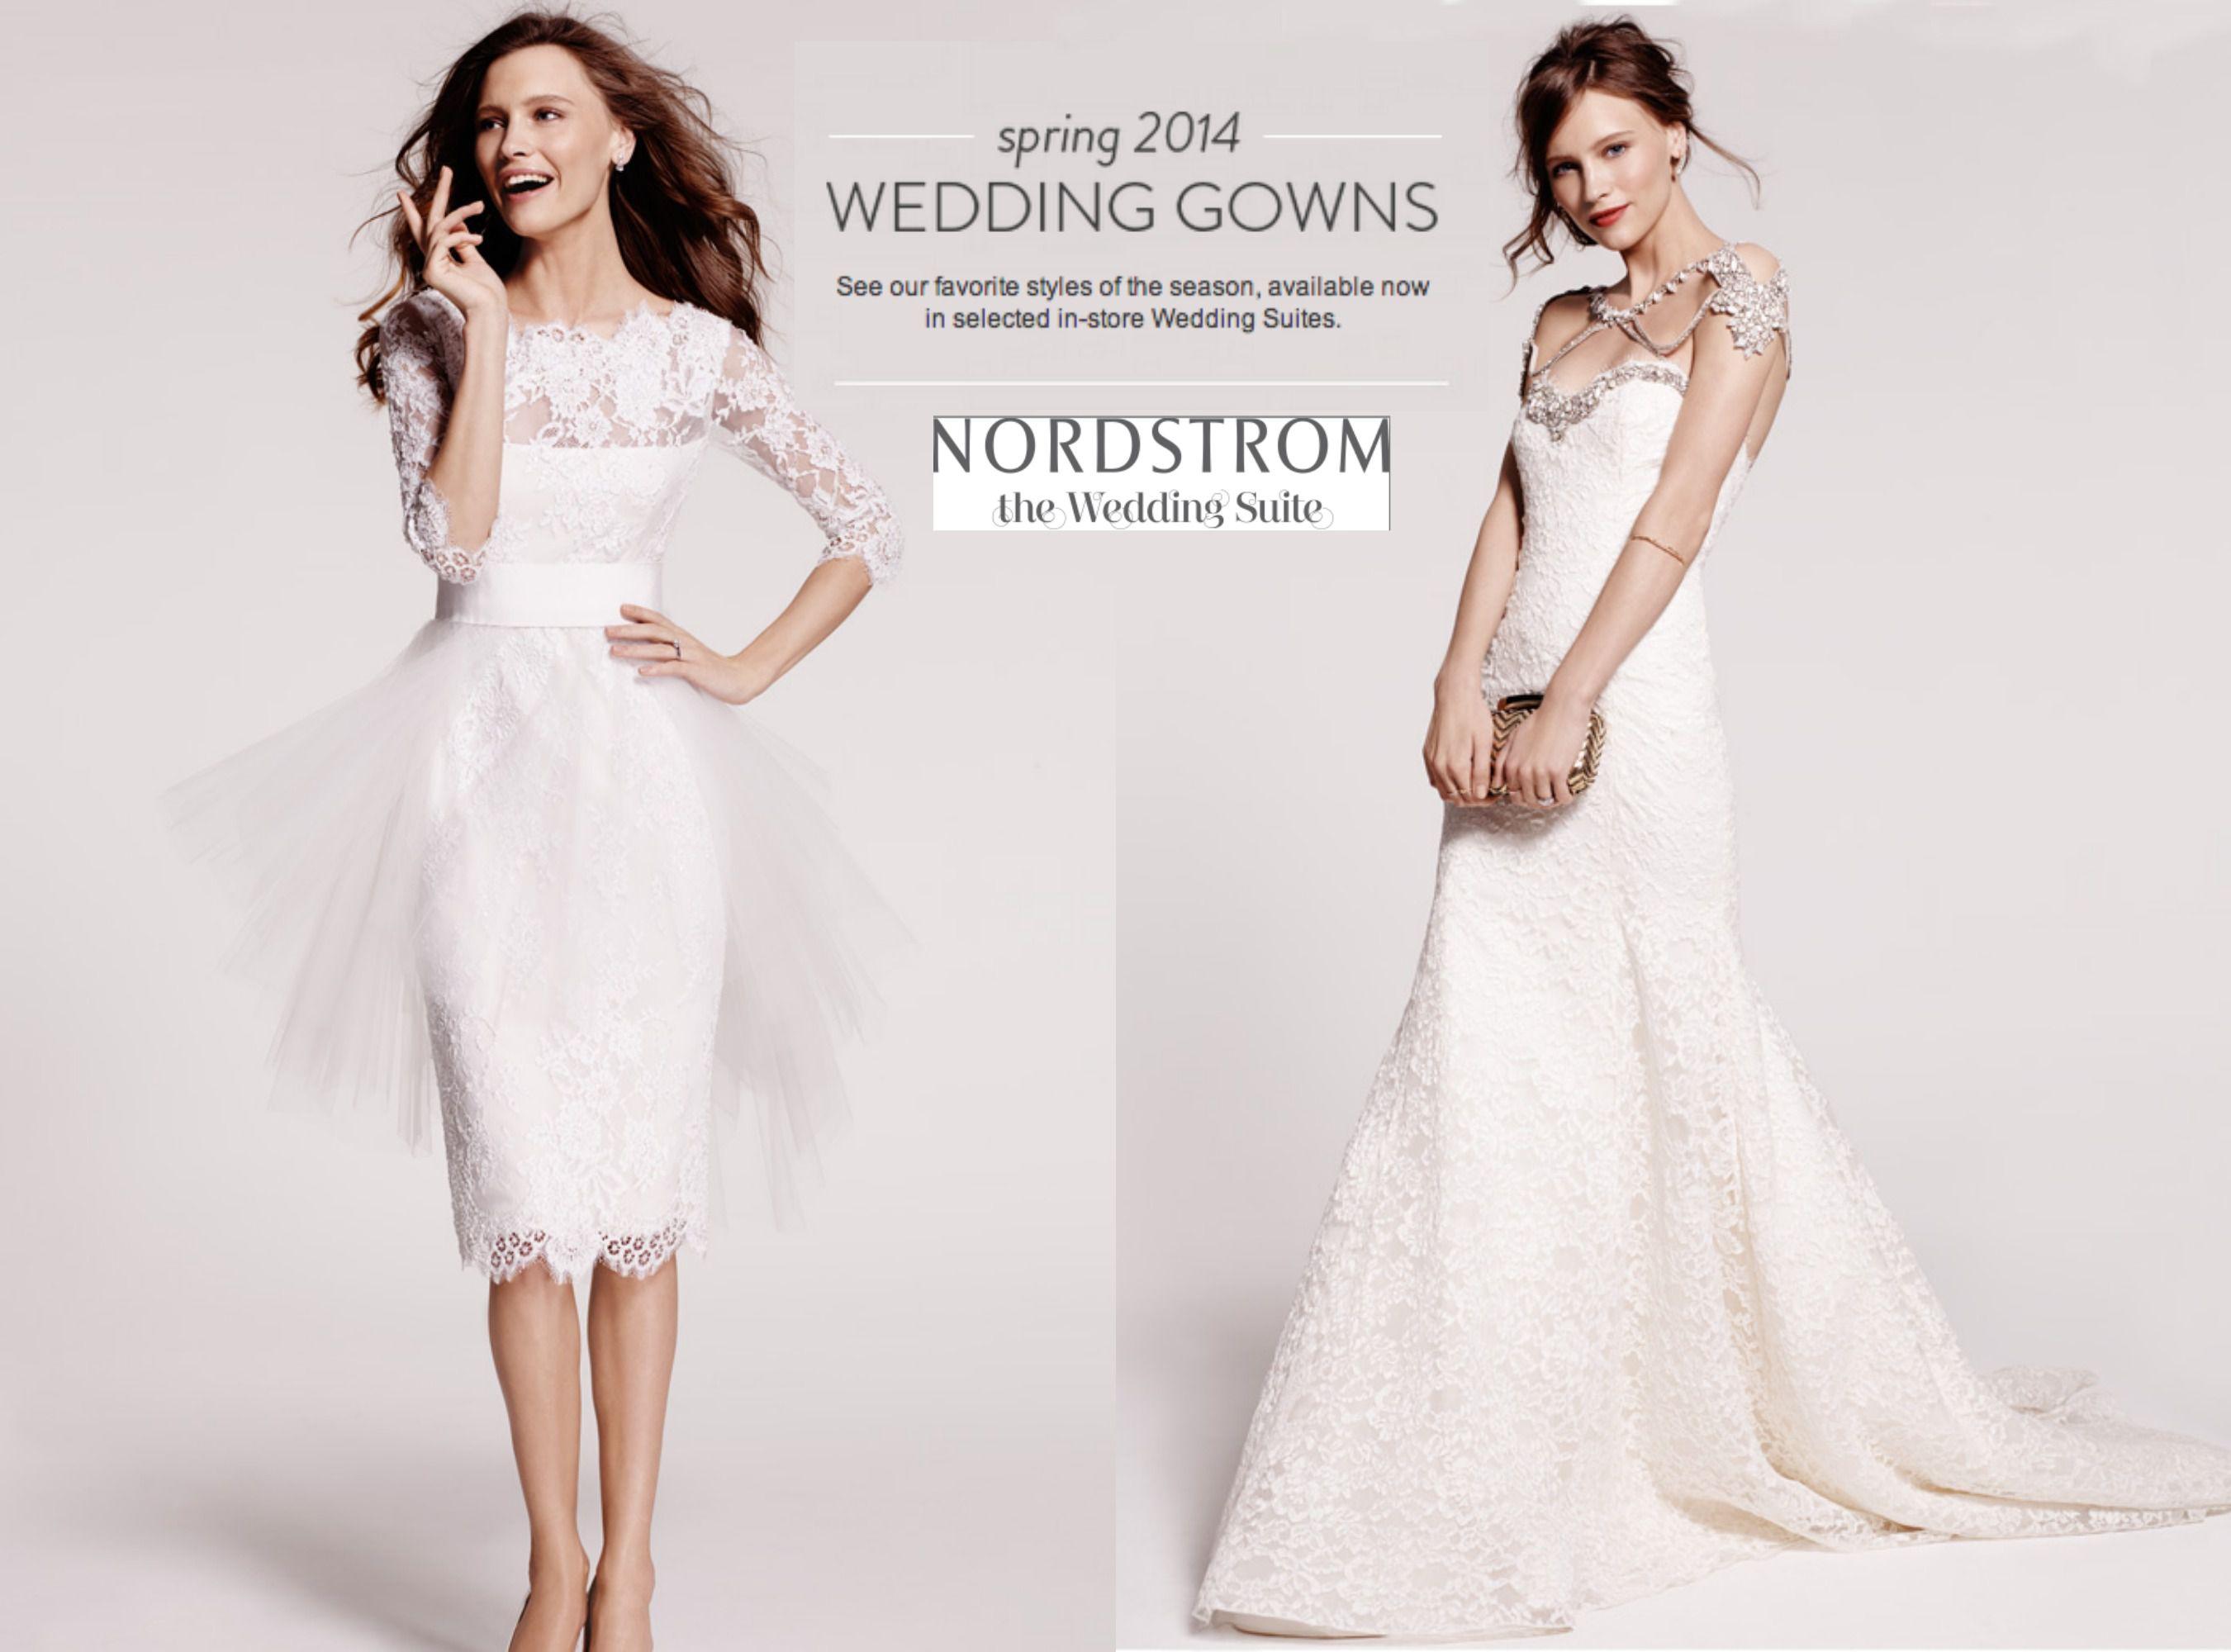 Nordstrom Wedding Suite Spring Preview